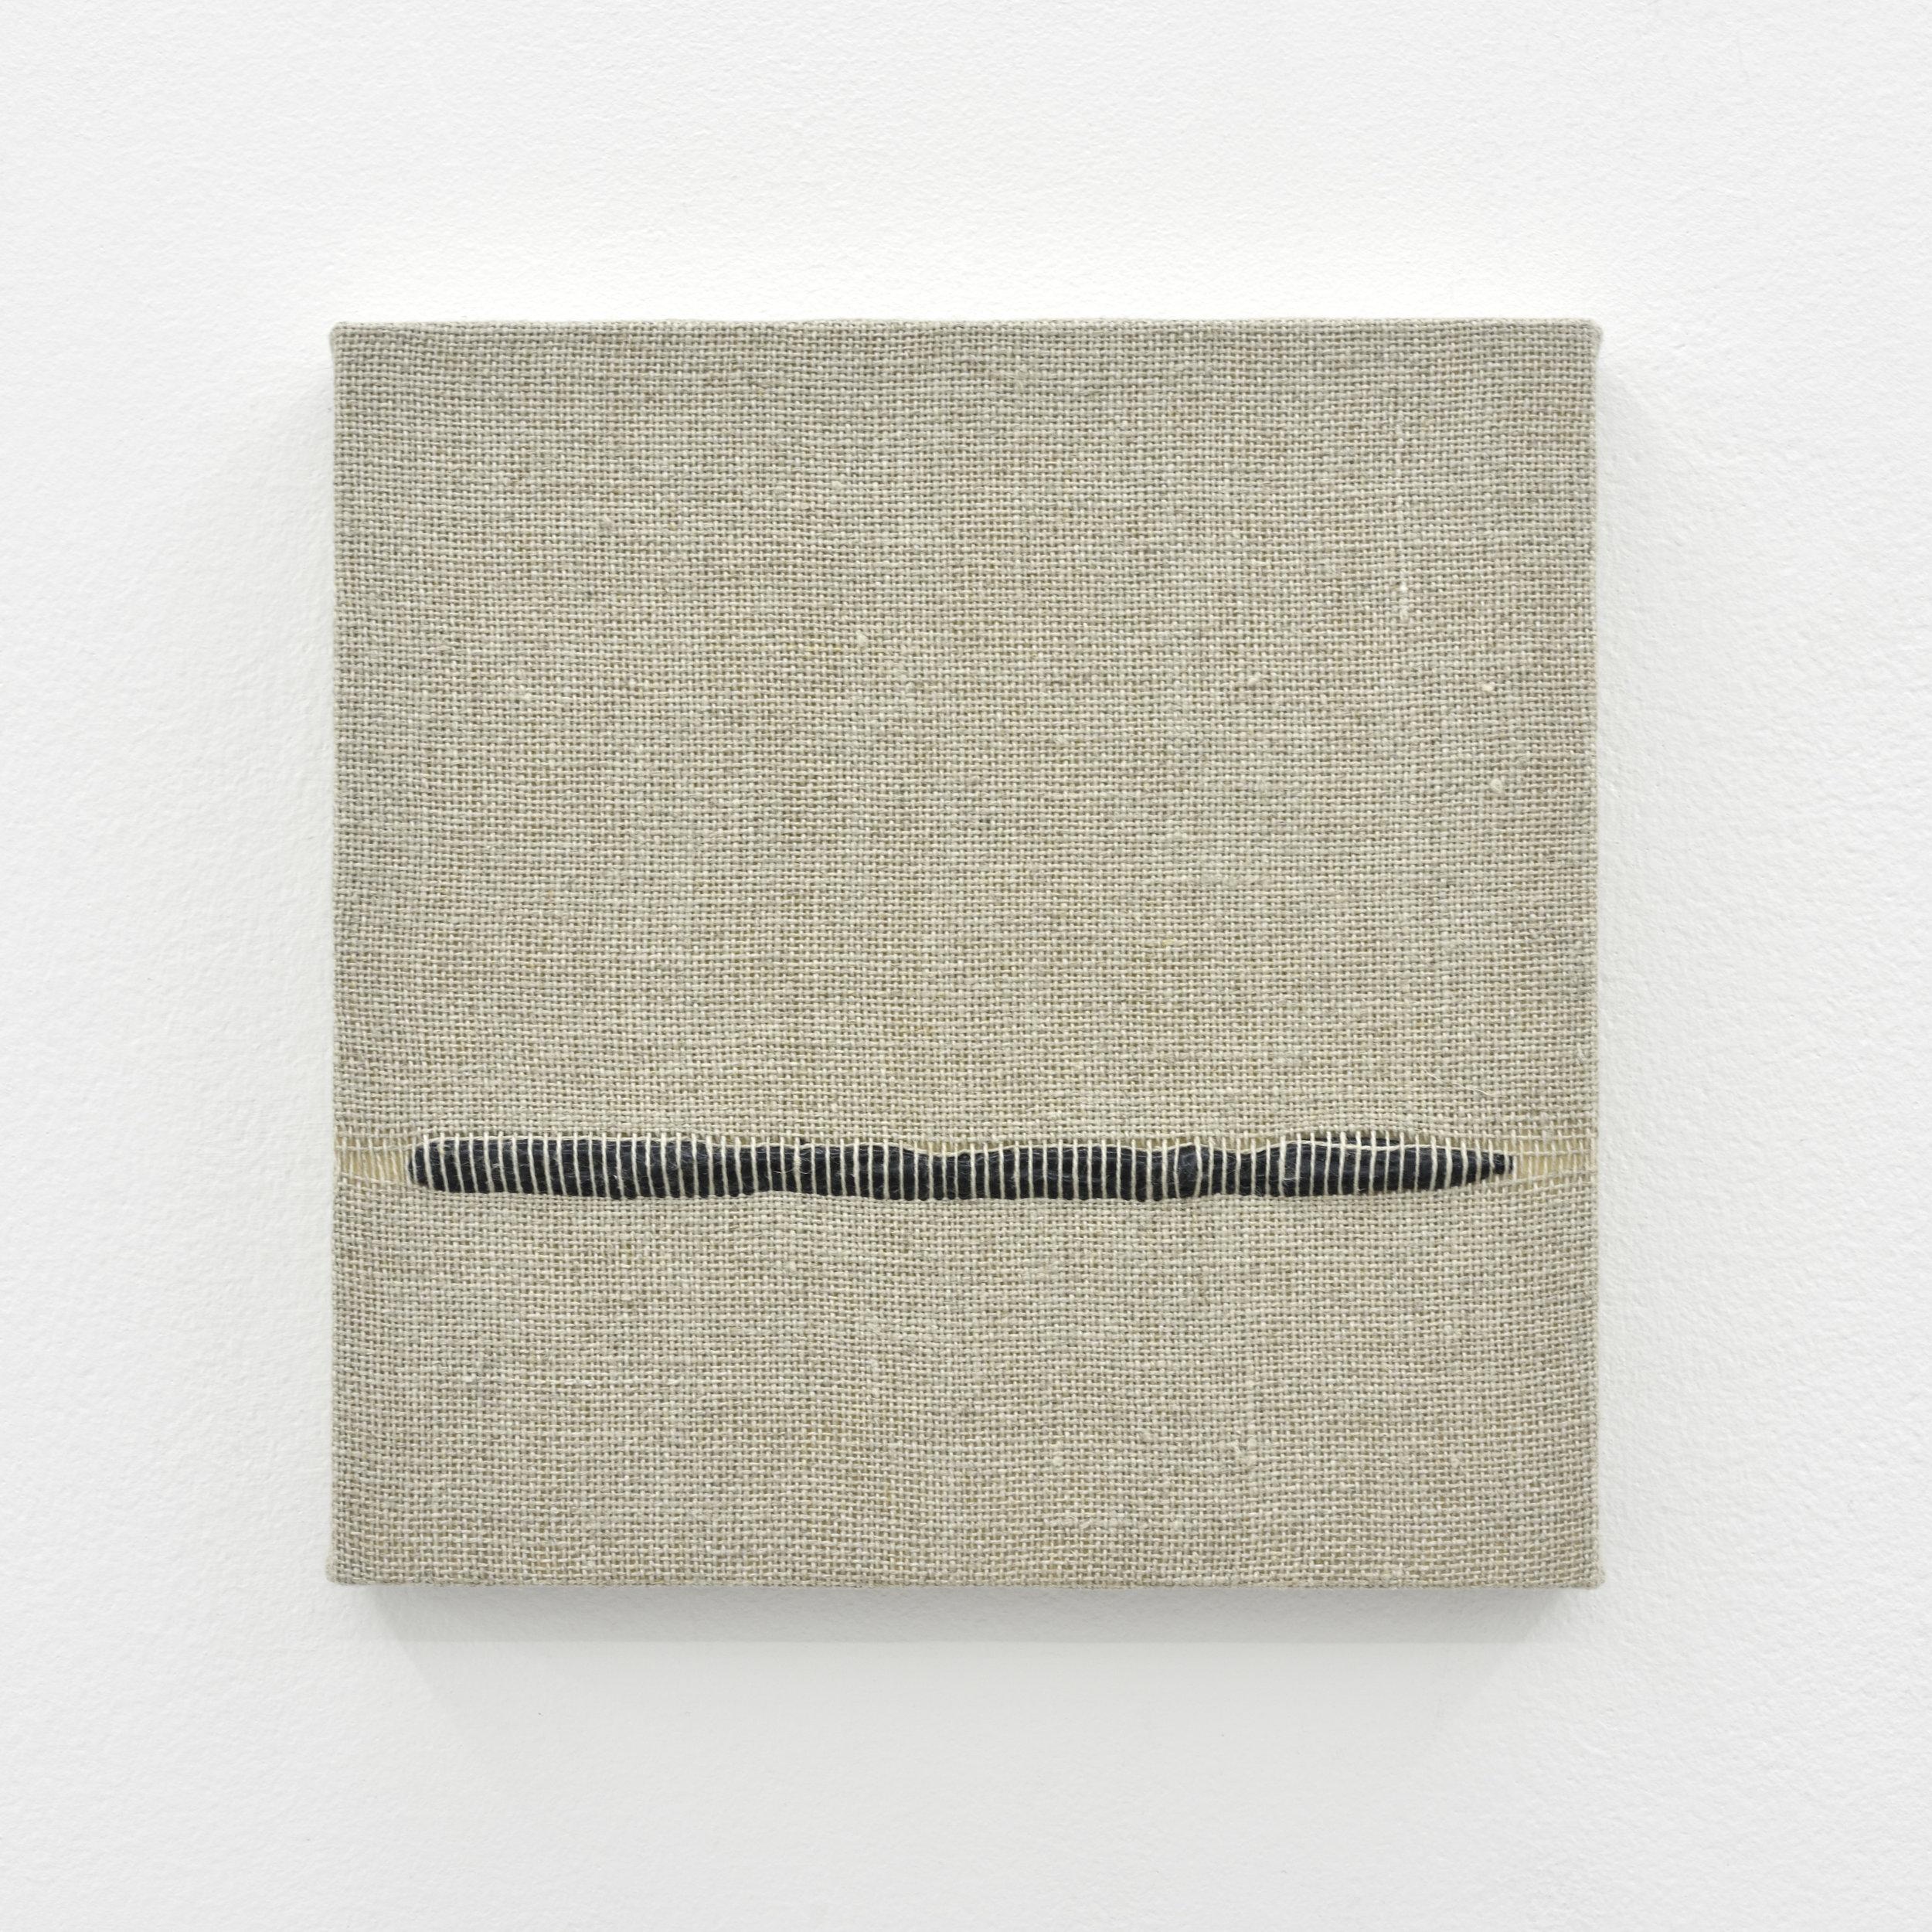 Composition for Woven Horizon Line (Black), 2017 acrylic paint woven through linen 20 x 20 x 2 cm - 7 7/8 x 7 7/8 x 0 3/4 inches